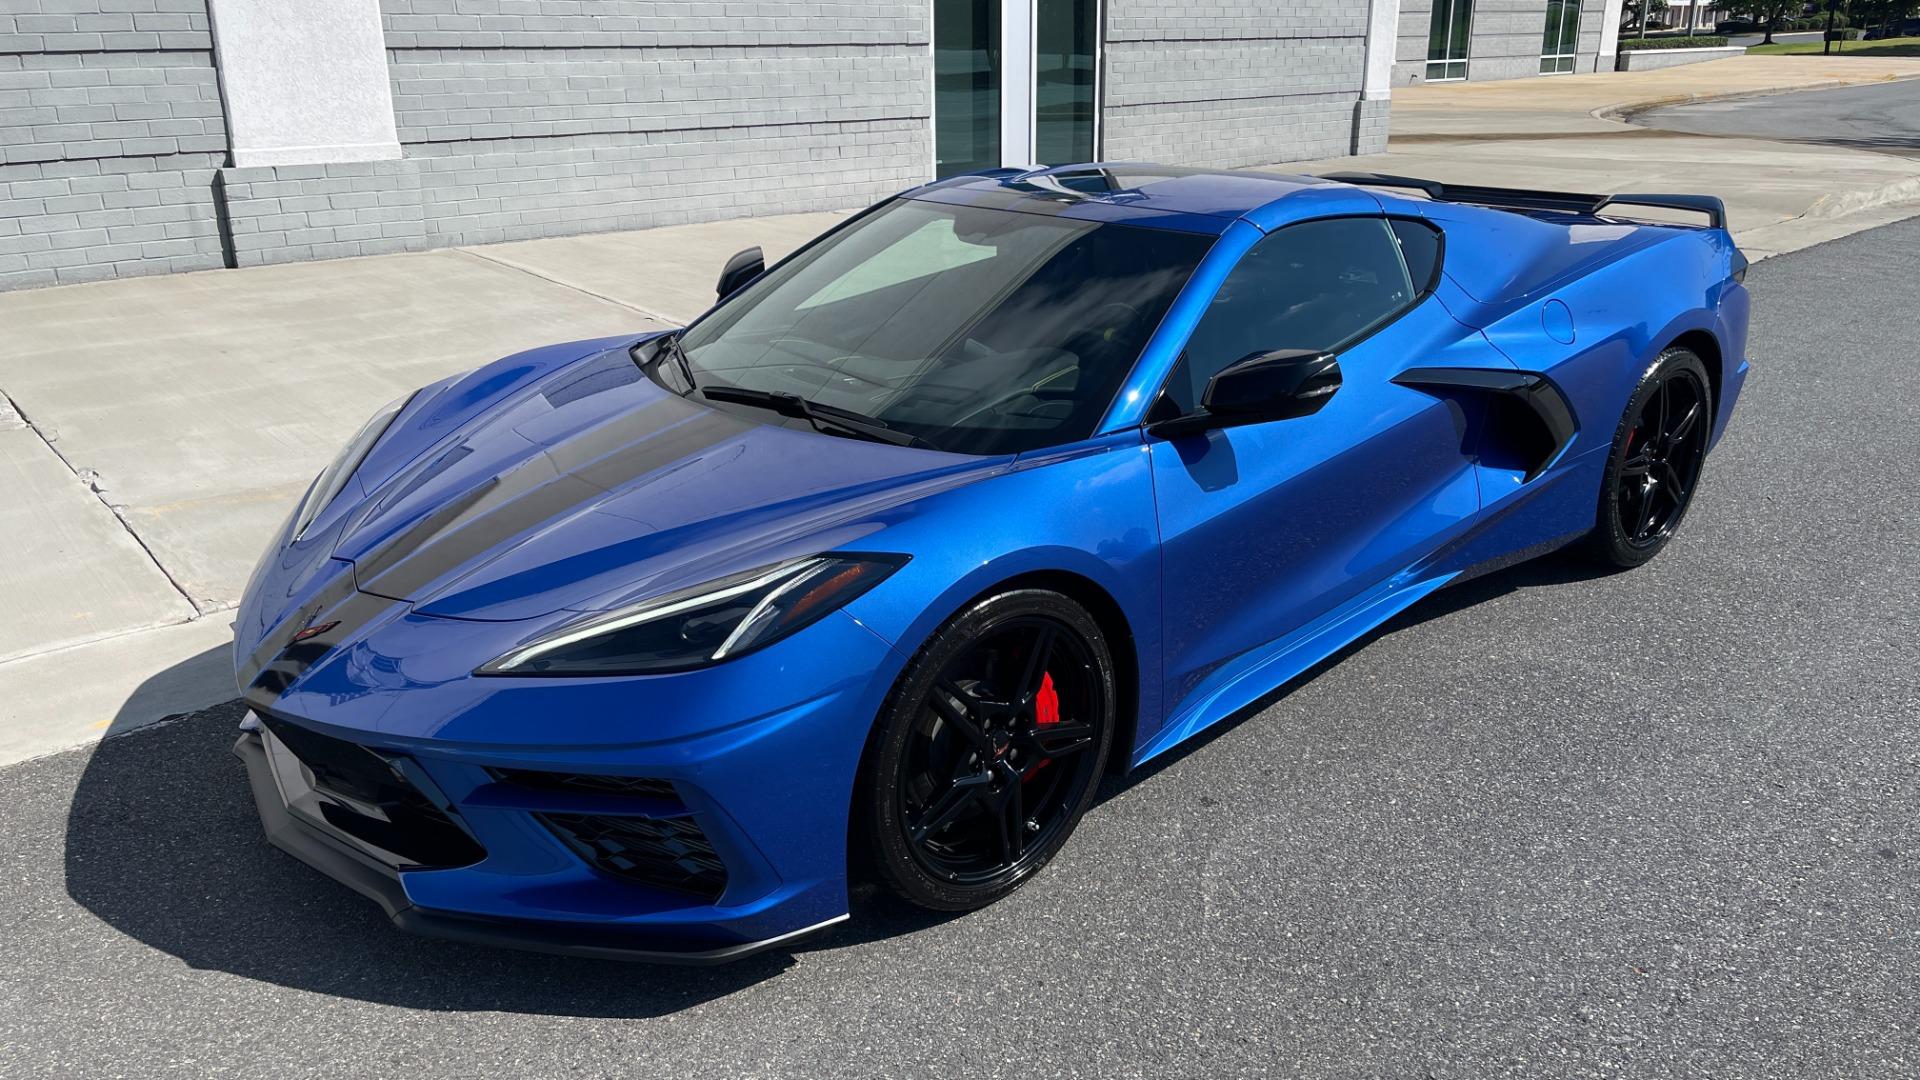 Used 2021 Chevrolet CORVETTE STINGRAY 3LT COUPE / 8-SPD / PERF PKG / NAV / BOSE / REARVIEW for sale $110,995 at Formula Imports in Charlotte NC 28227 3